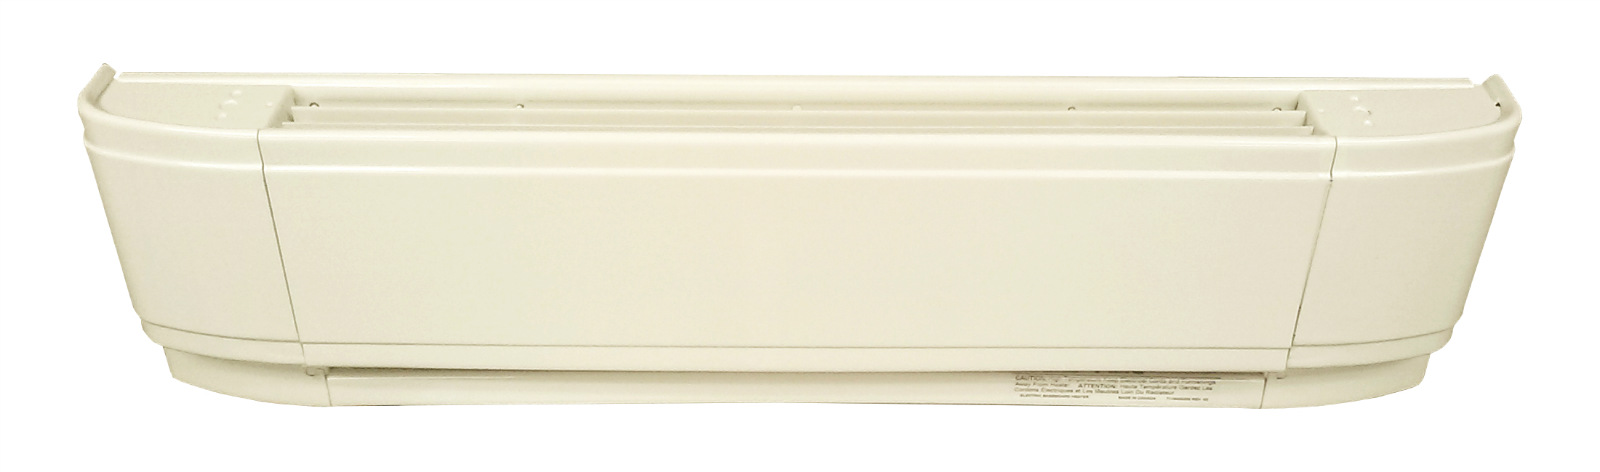 "Dimplex LCM752031 Almond 75"" Baseboard Heater 2000/1500W 240"